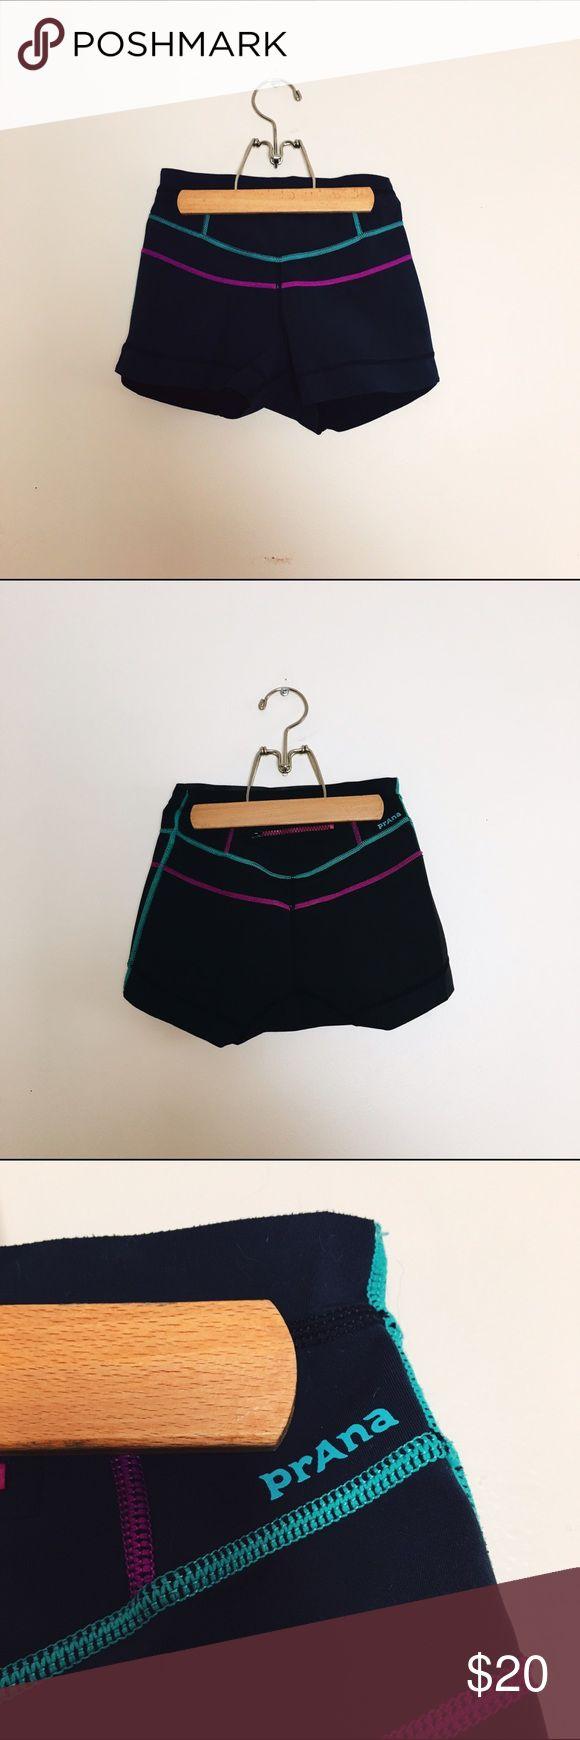 PrAna hydra short High-waist surf short, neoprene skin at interior waistband for extra grip, raw edging, 55% recycled polyester / 40% neoprene / 5% spandex Prana Shorts